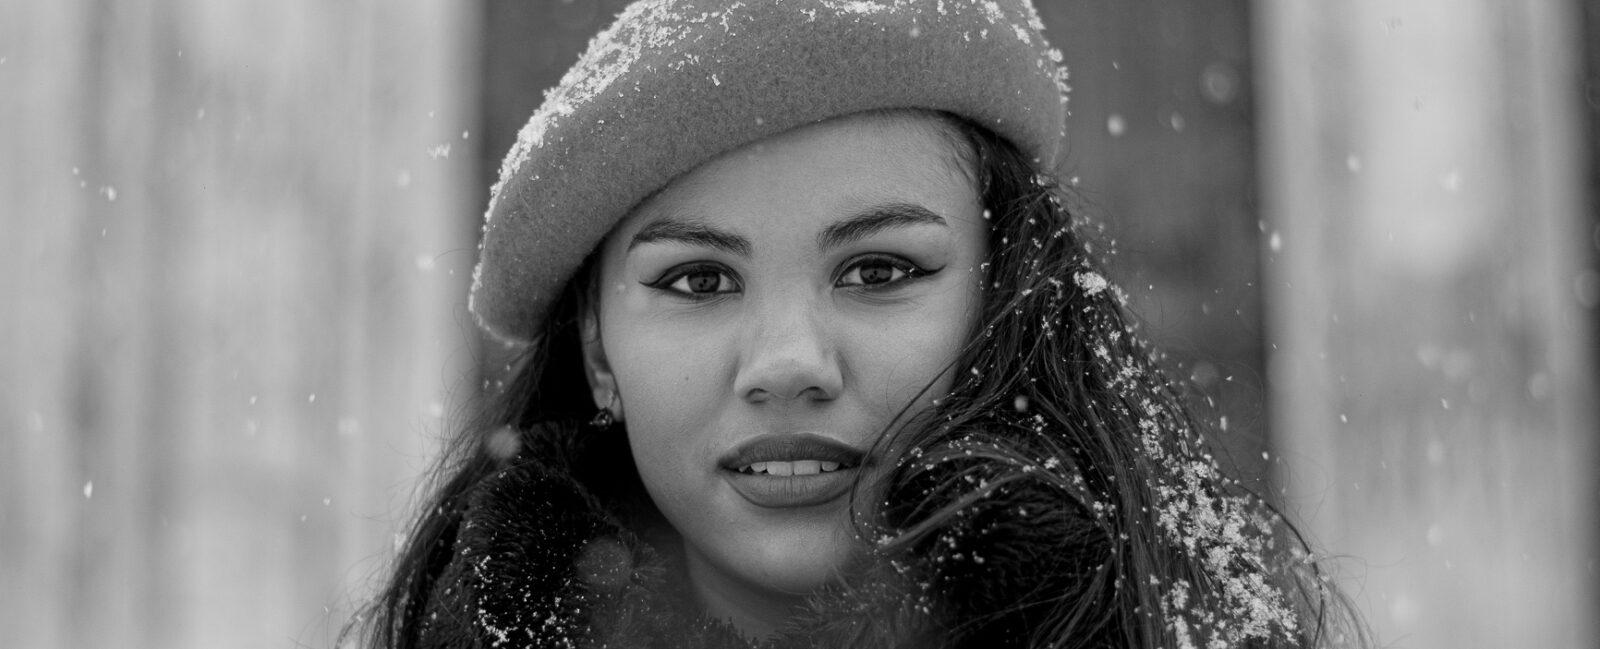 Photographe Amiens